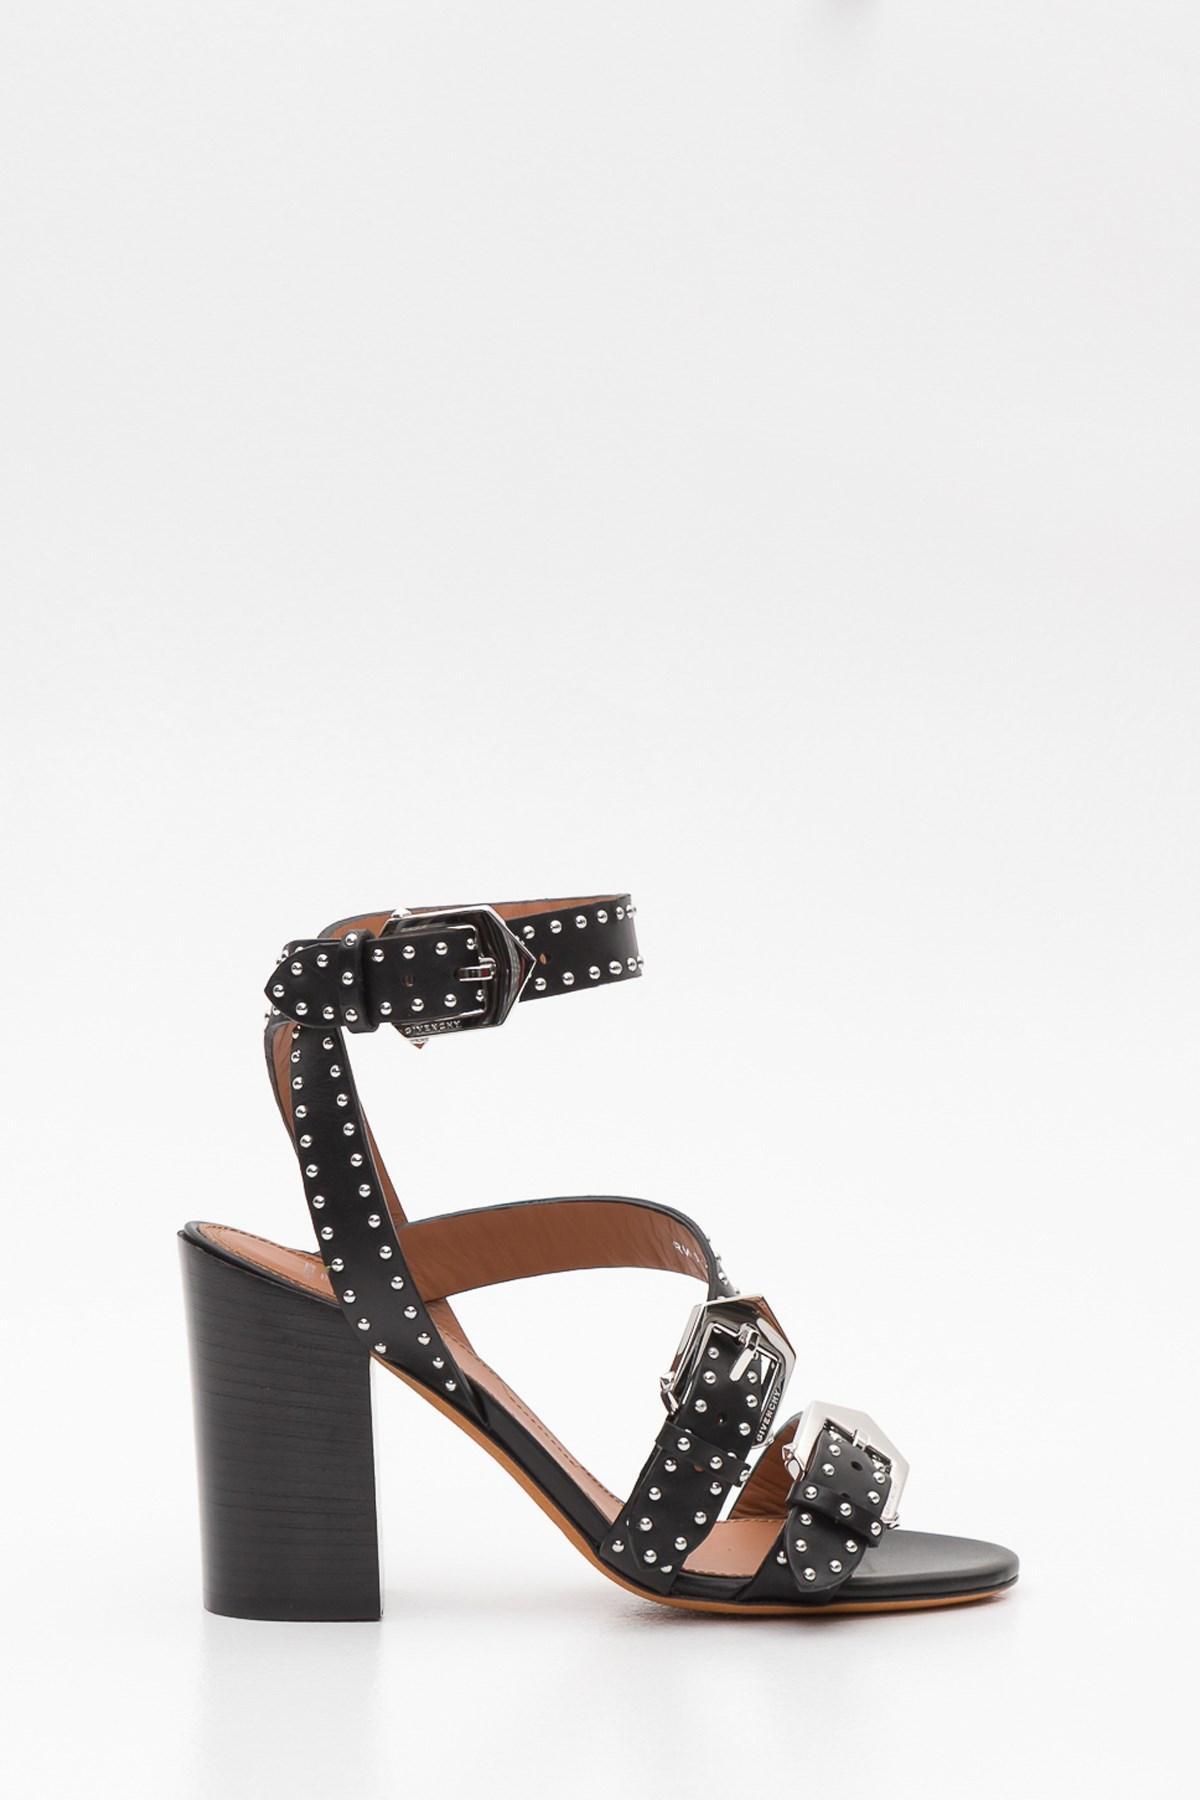 7c5e4d97d1b Lyst - Givenchy Elegant Studs Sandals